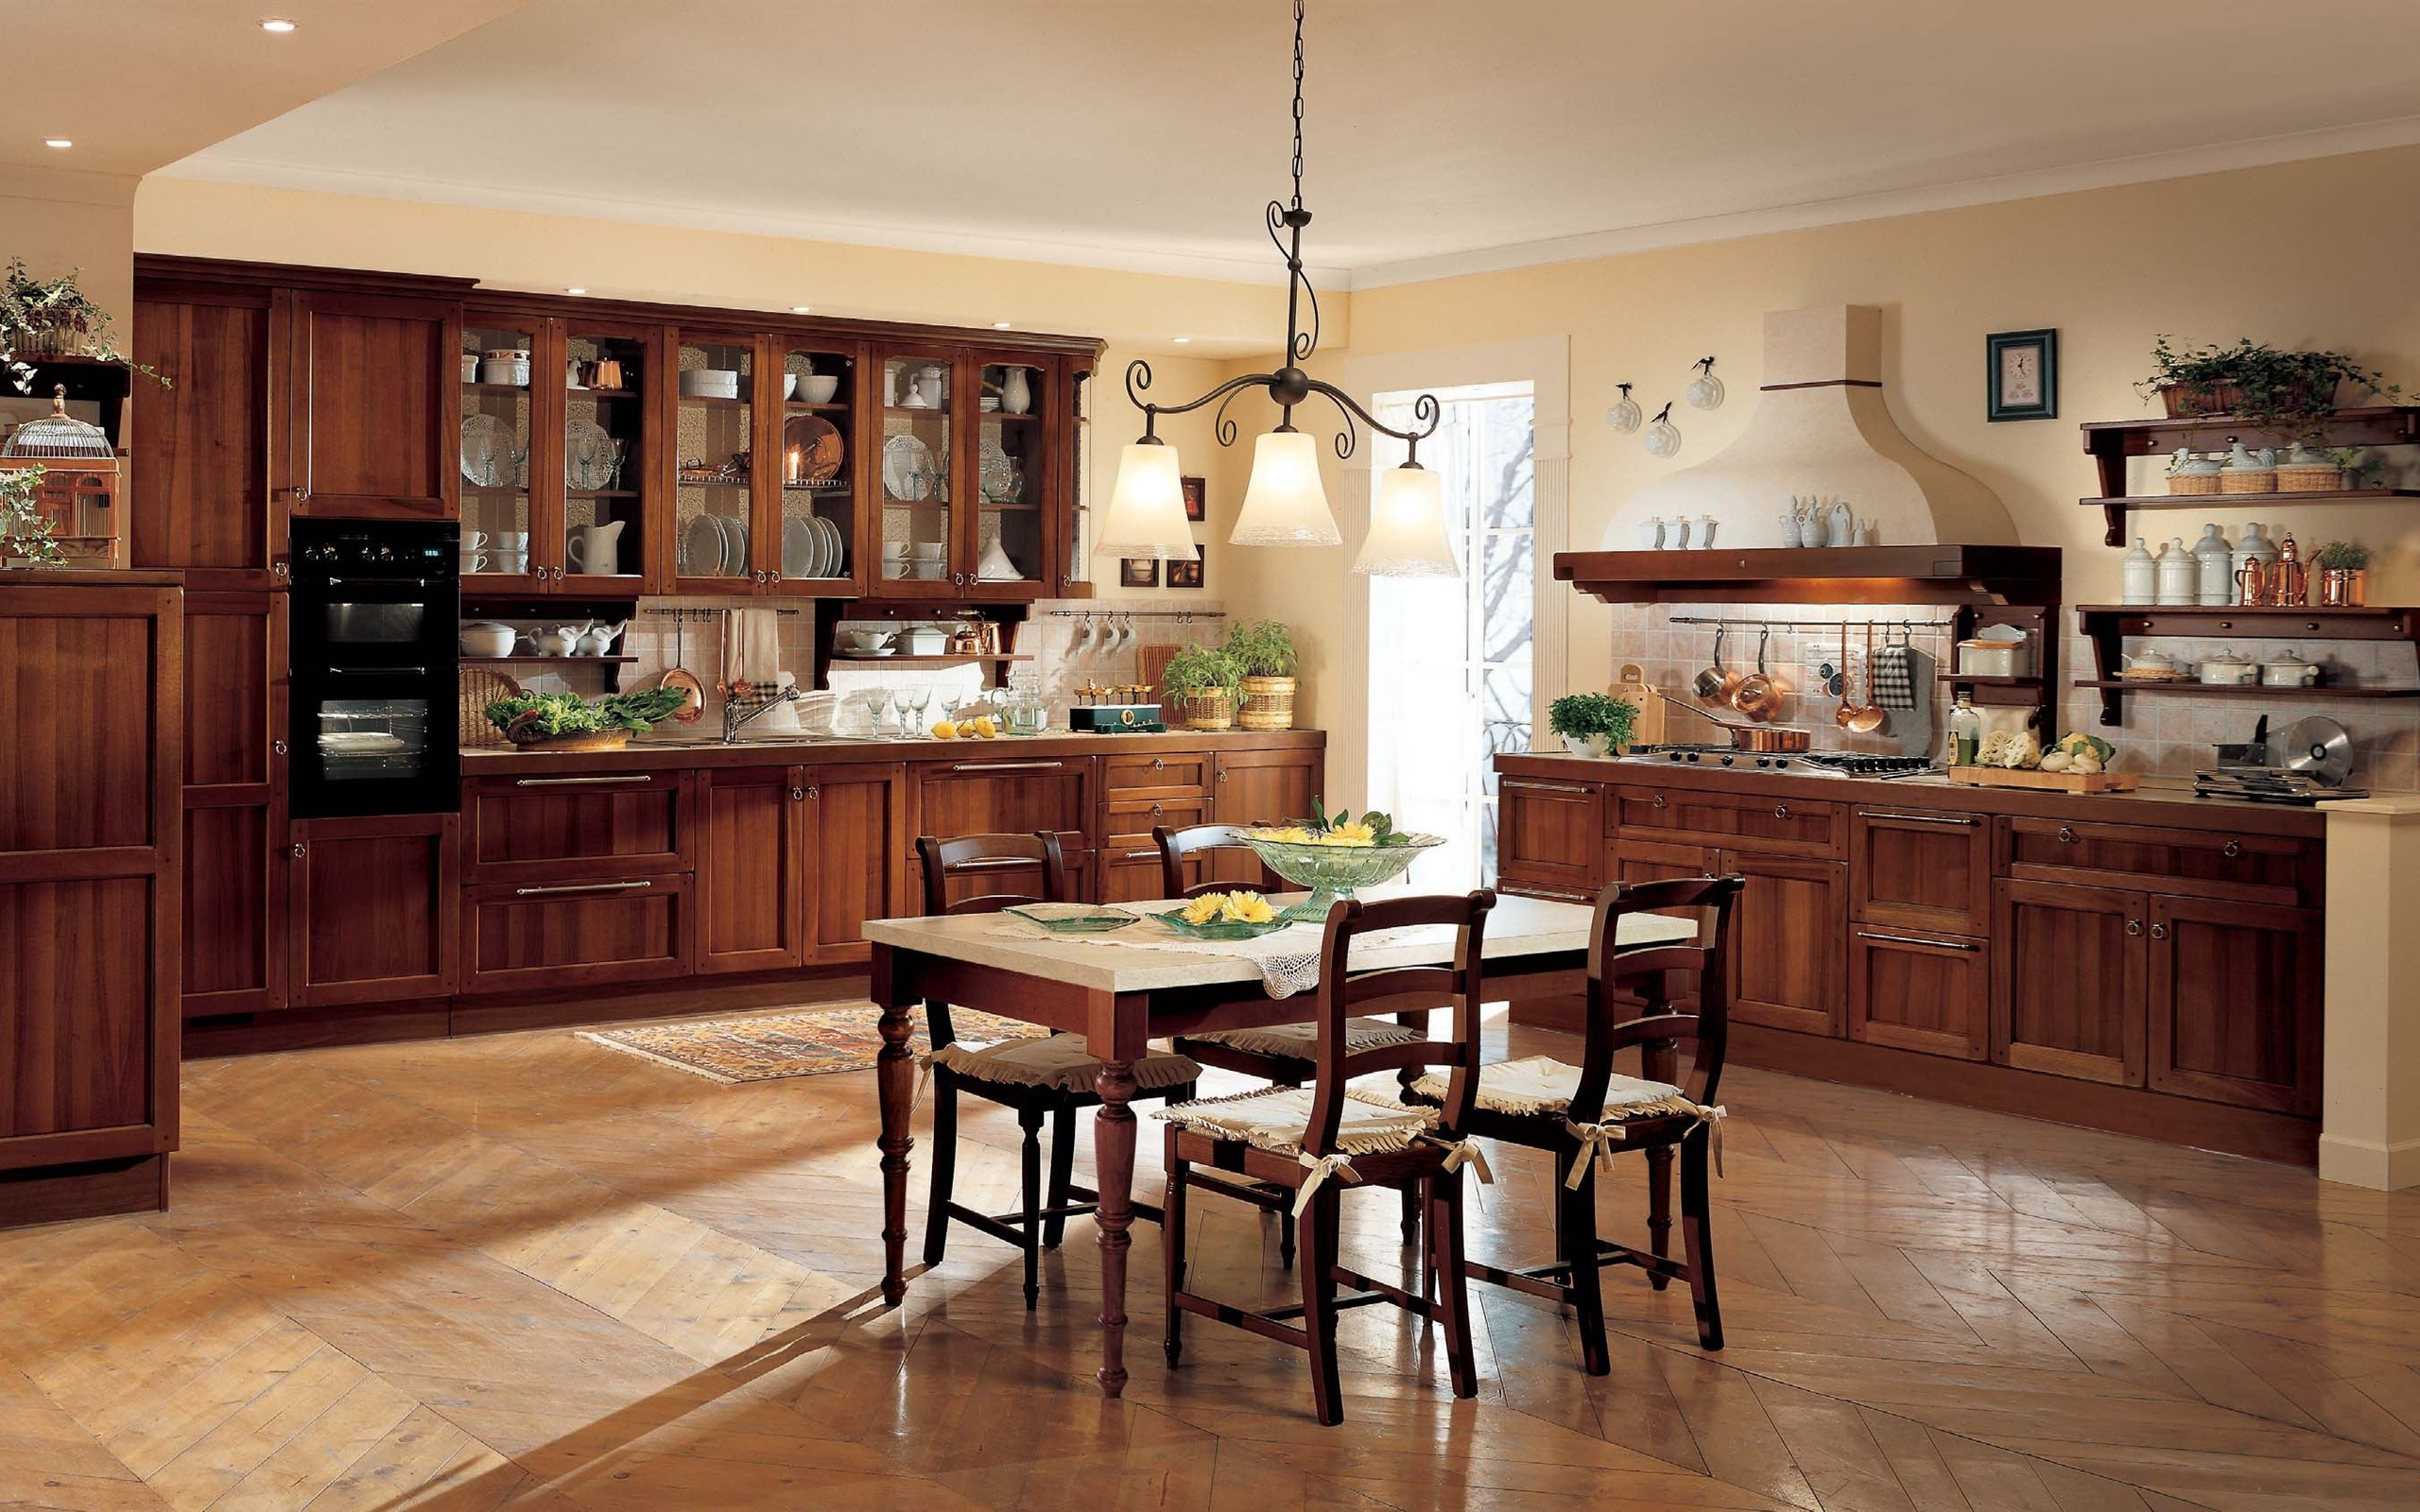 Fondos de pantalla cocina comedor interior mesa - Interior muebles cocina ...